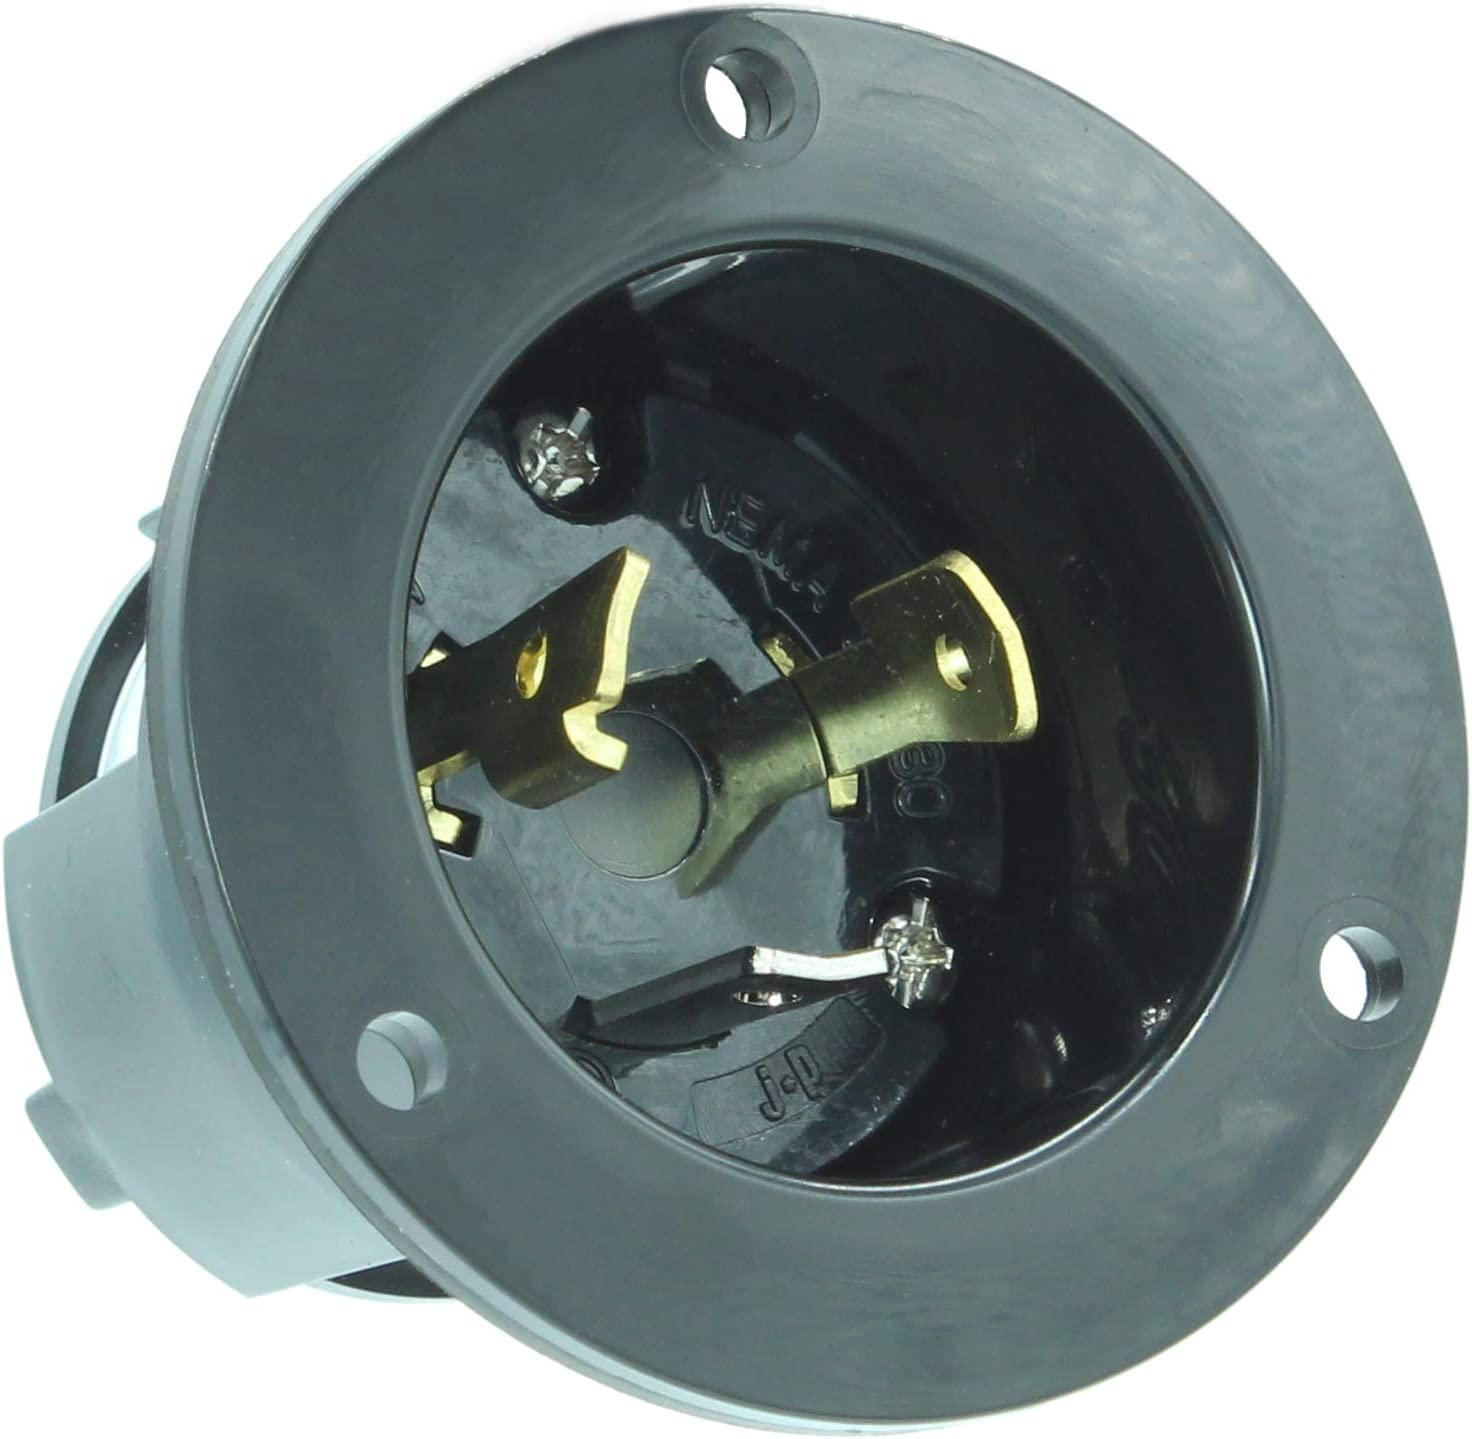 Black Industrial Grade NEMA L5-30 Flanged Inlet Generator Plug Locking Receptacle Socket Grounding 3750 Watts Journeyman-Pro 2615 30A 125 Volt No Cover Included